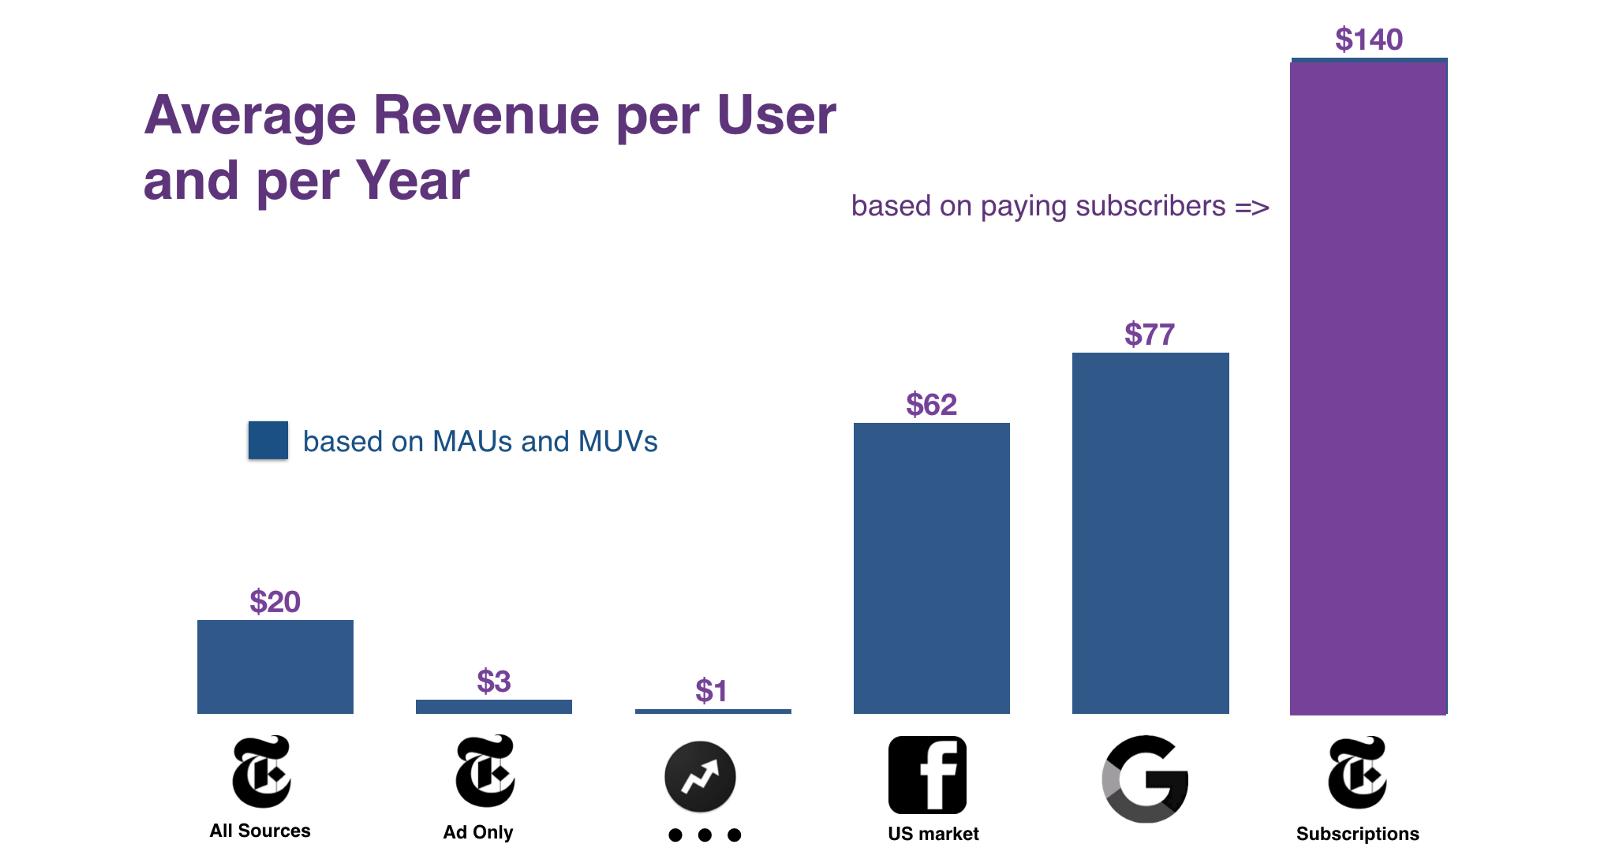 Arpu per user per year